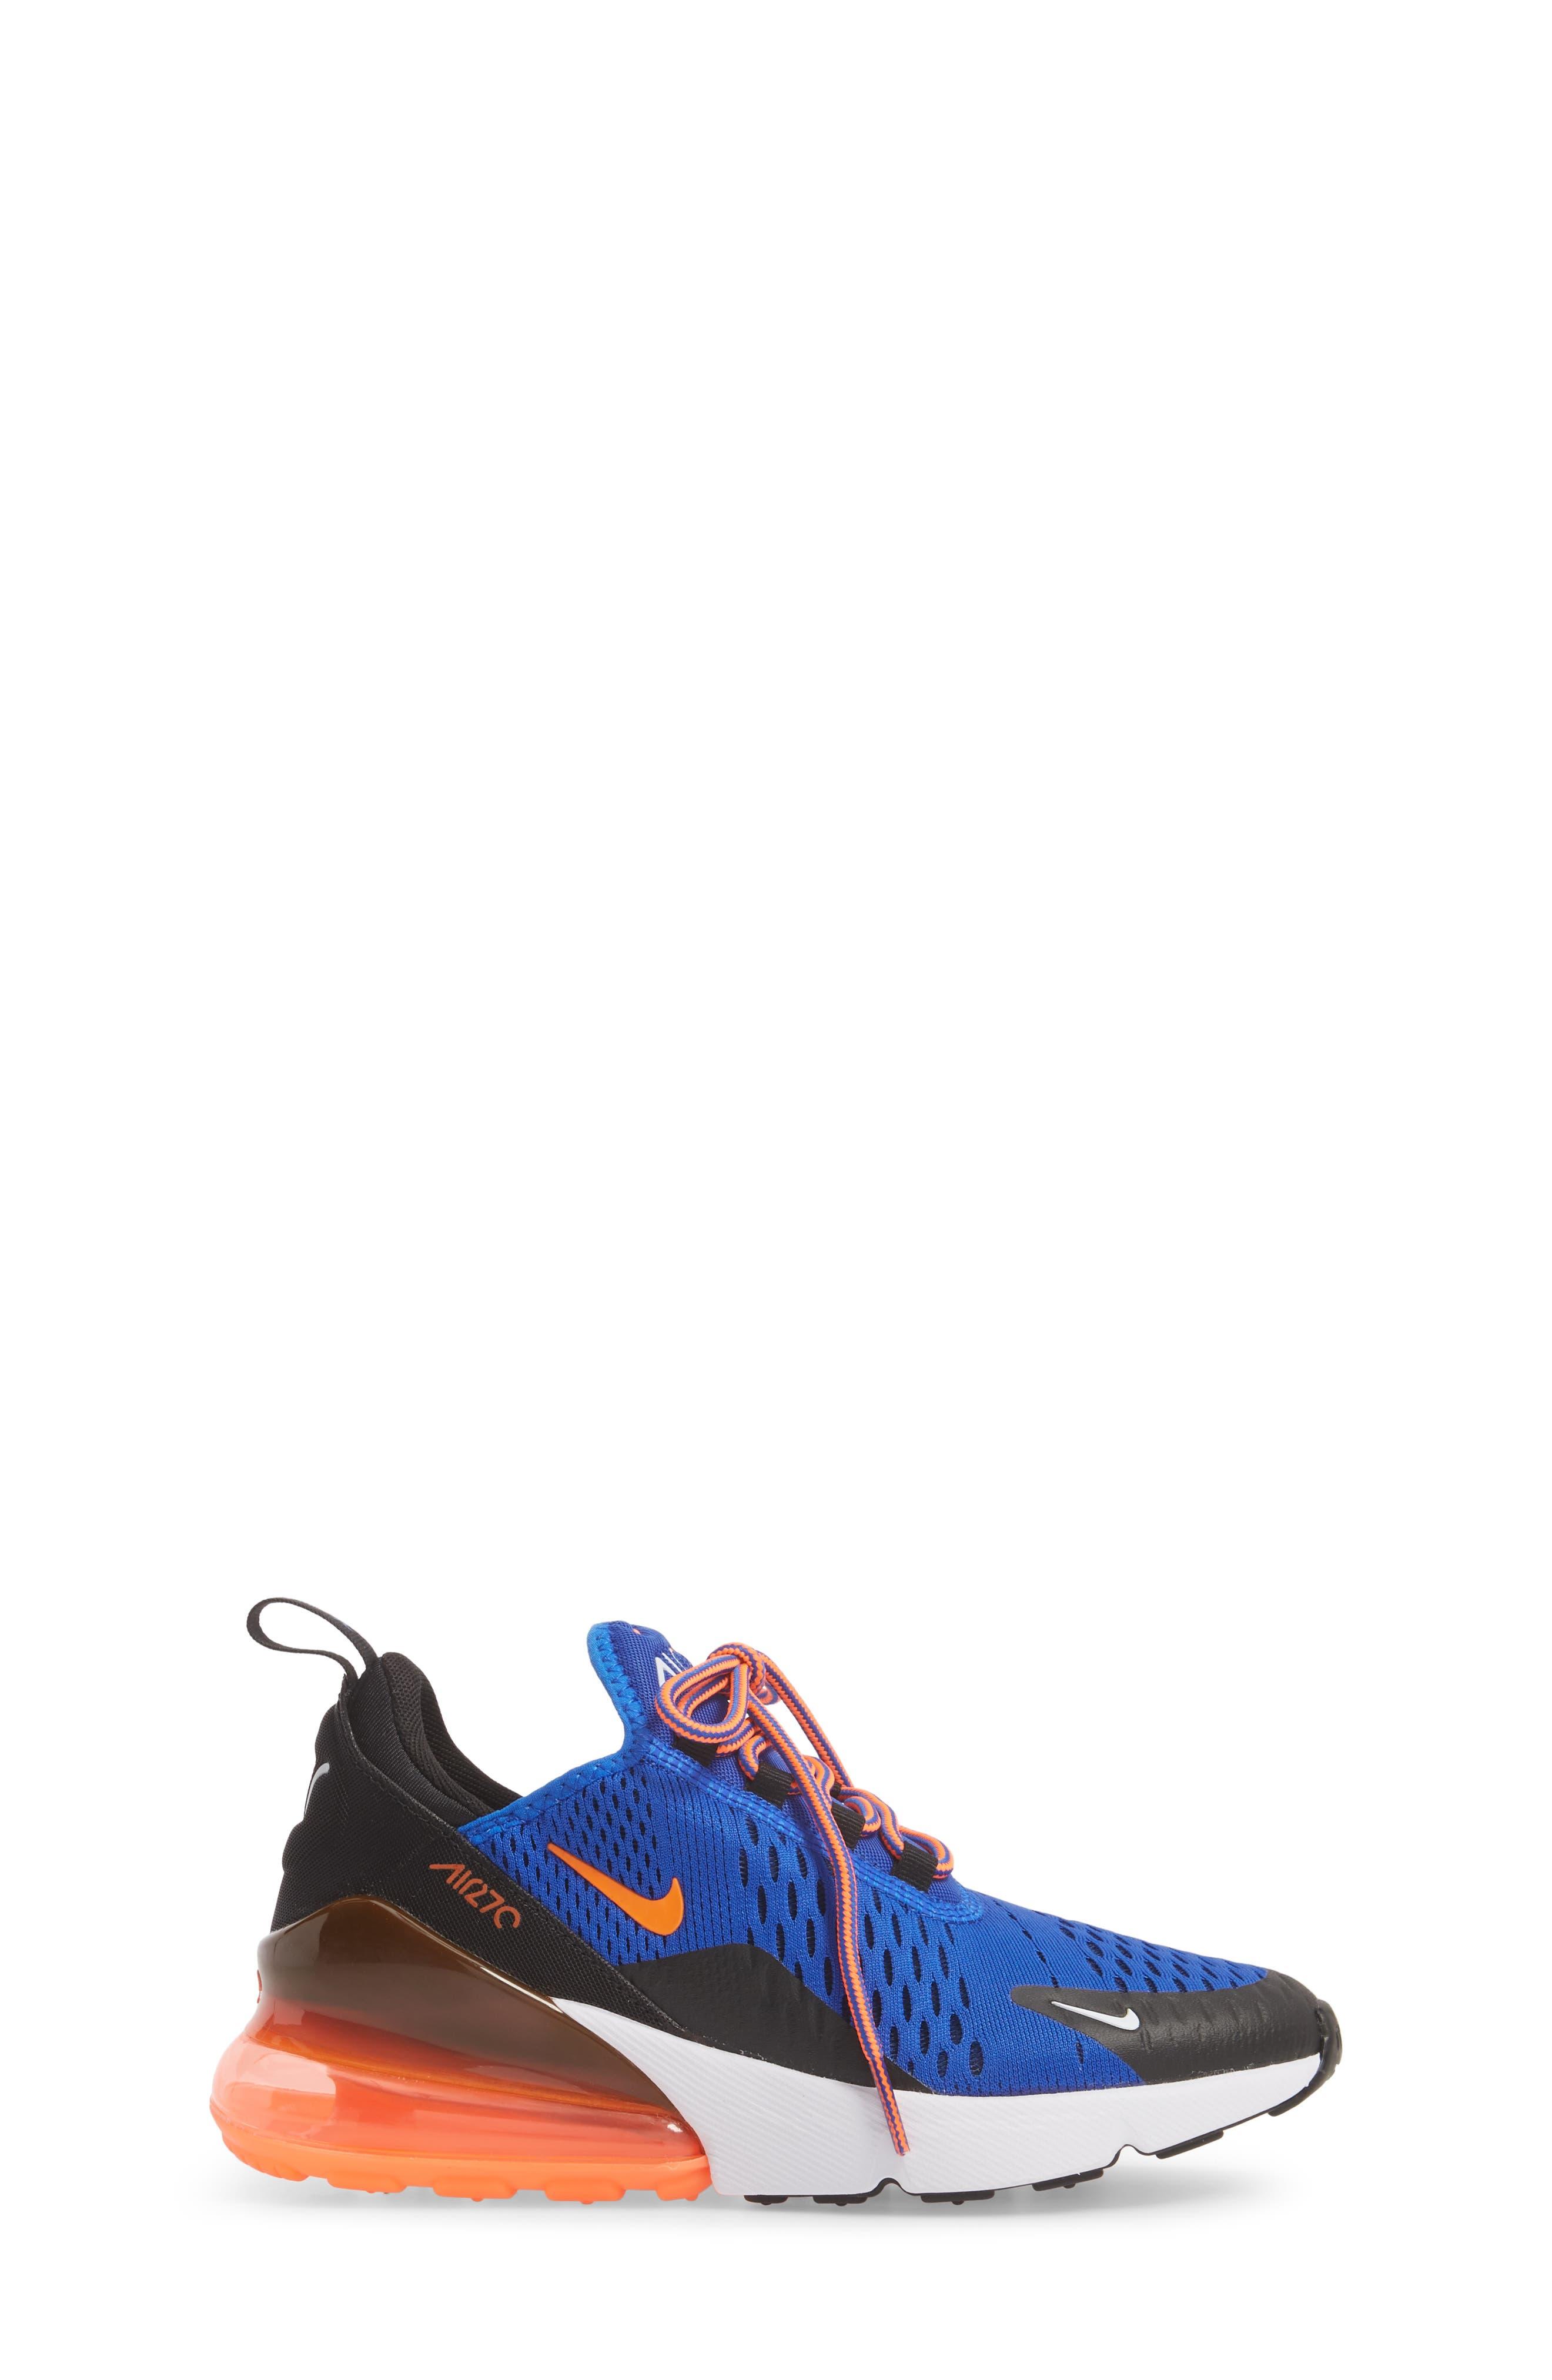 Air Max 270 Sneaker,                             Alternate thumbnail 3, color,                             Racer Blue/ Crimson/ Black